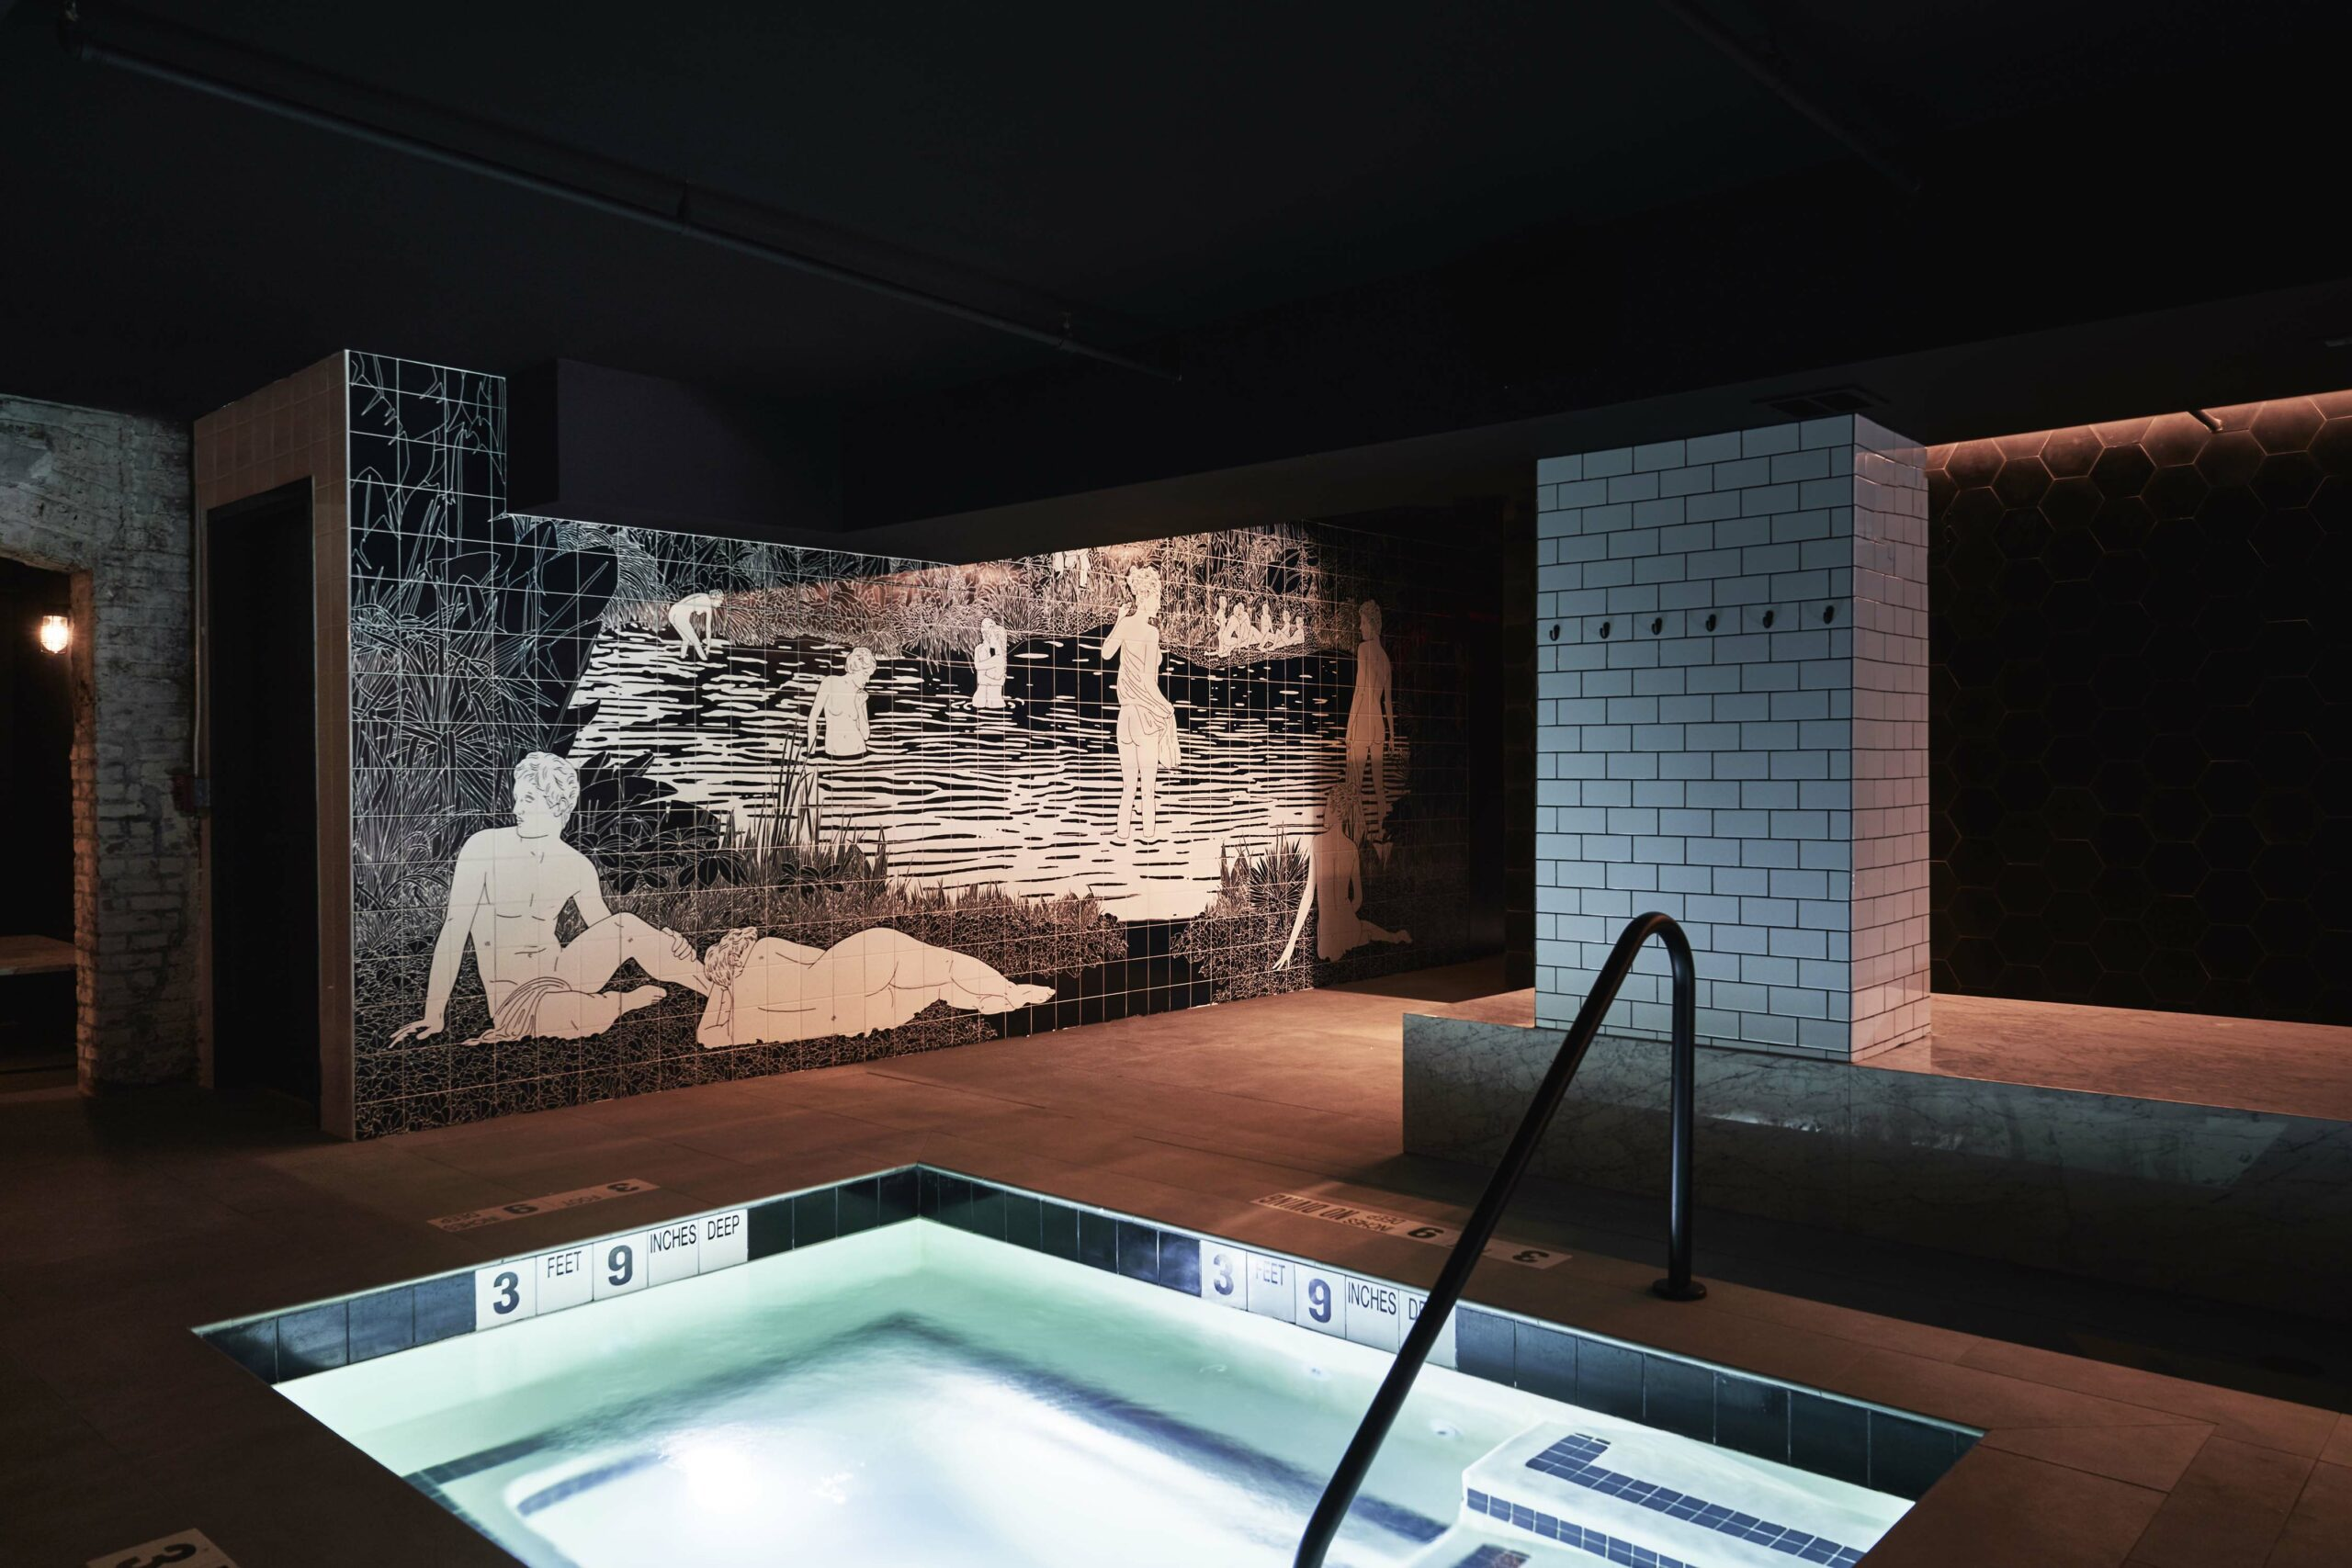 Williamsburg Bathhouse